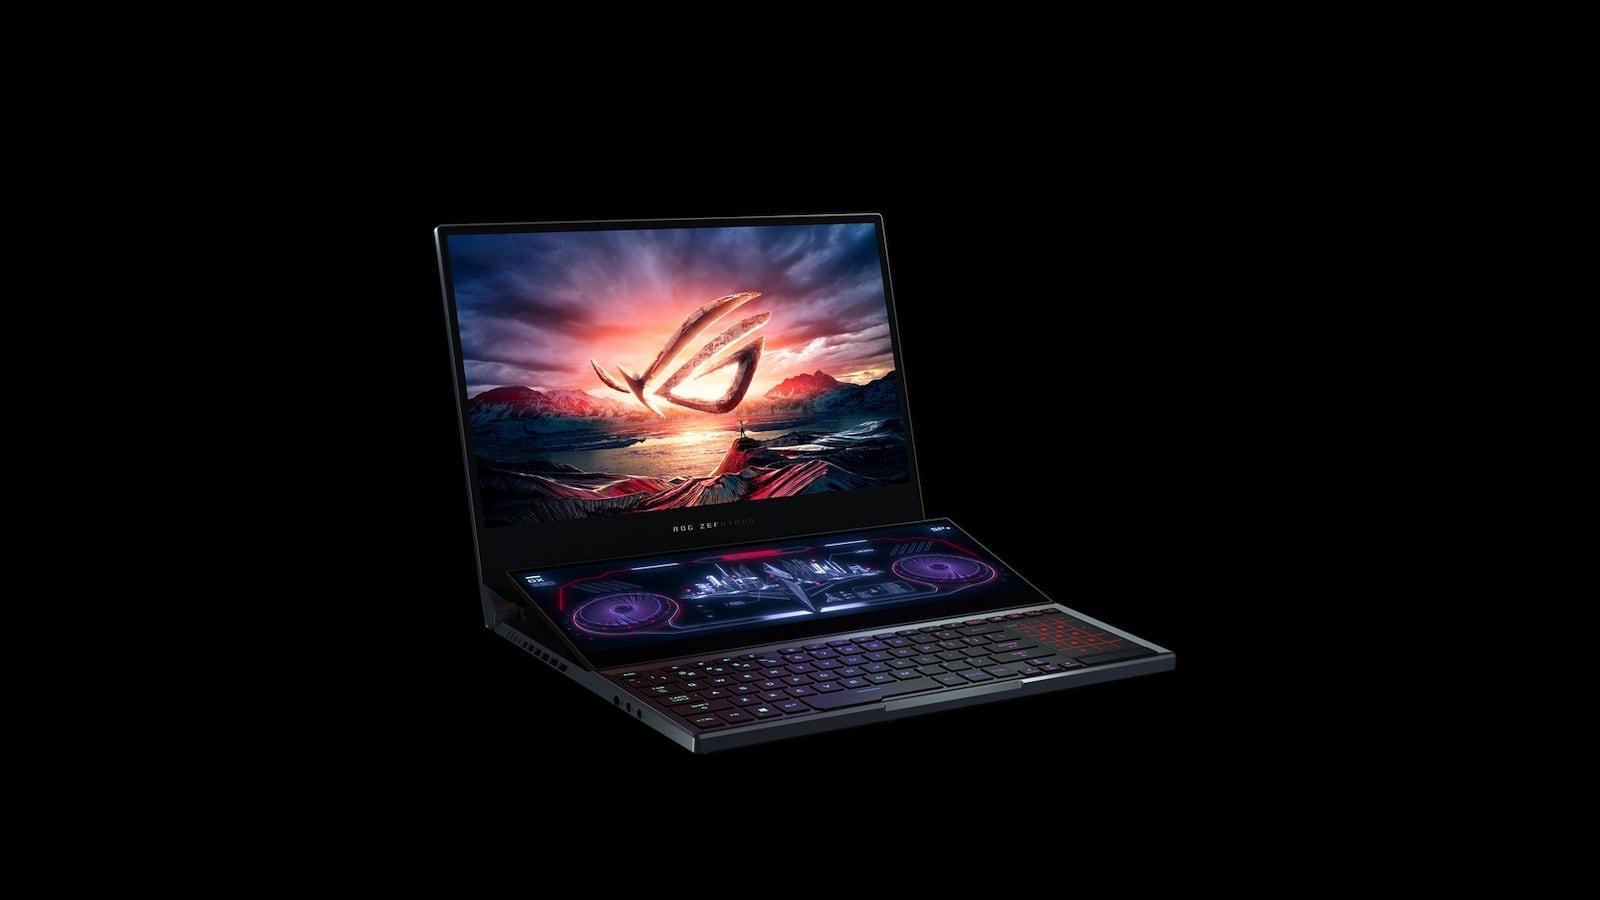 ASUS ROG Zephyrus Duo 15 Secondary Display Laptop has a smaller screen that tilts upward